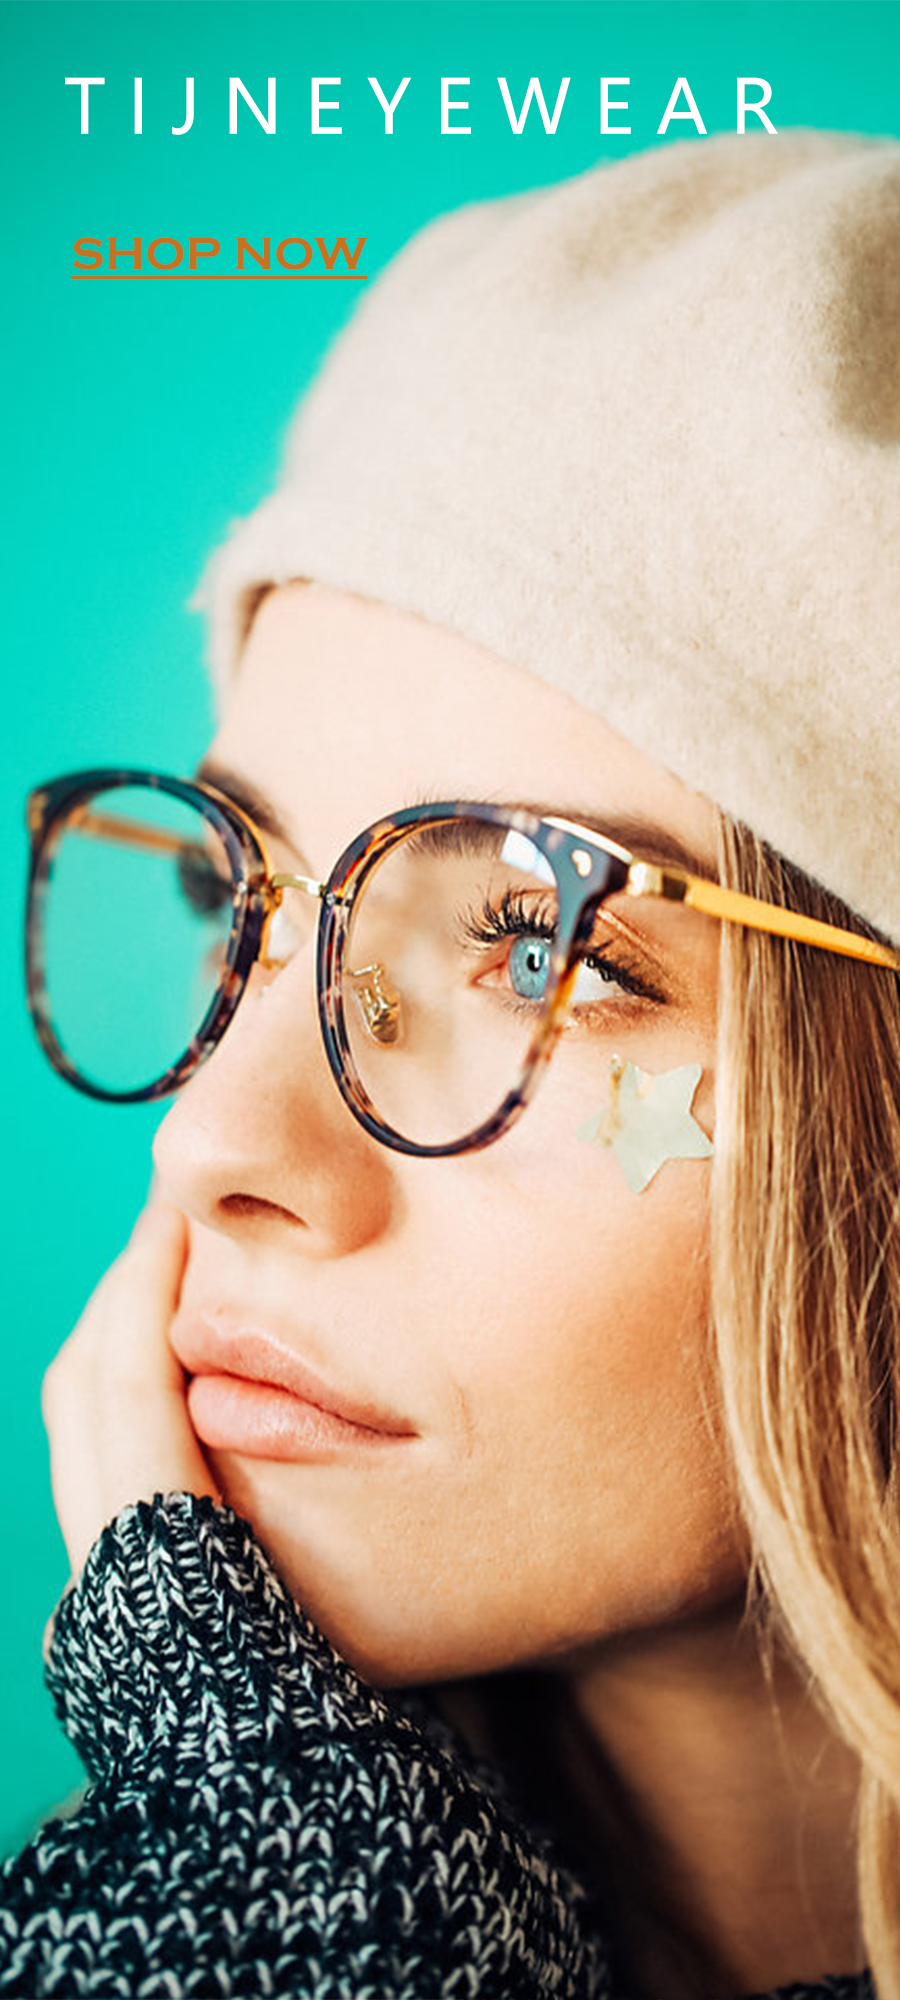 9fa6e96cf07 You may get a new look.Top sale glasses in 2018.  eyewear  fashion eyewear   sunglasses eye  fashion accessories  fashion trend Red Bird Tortoise  Shell  ...